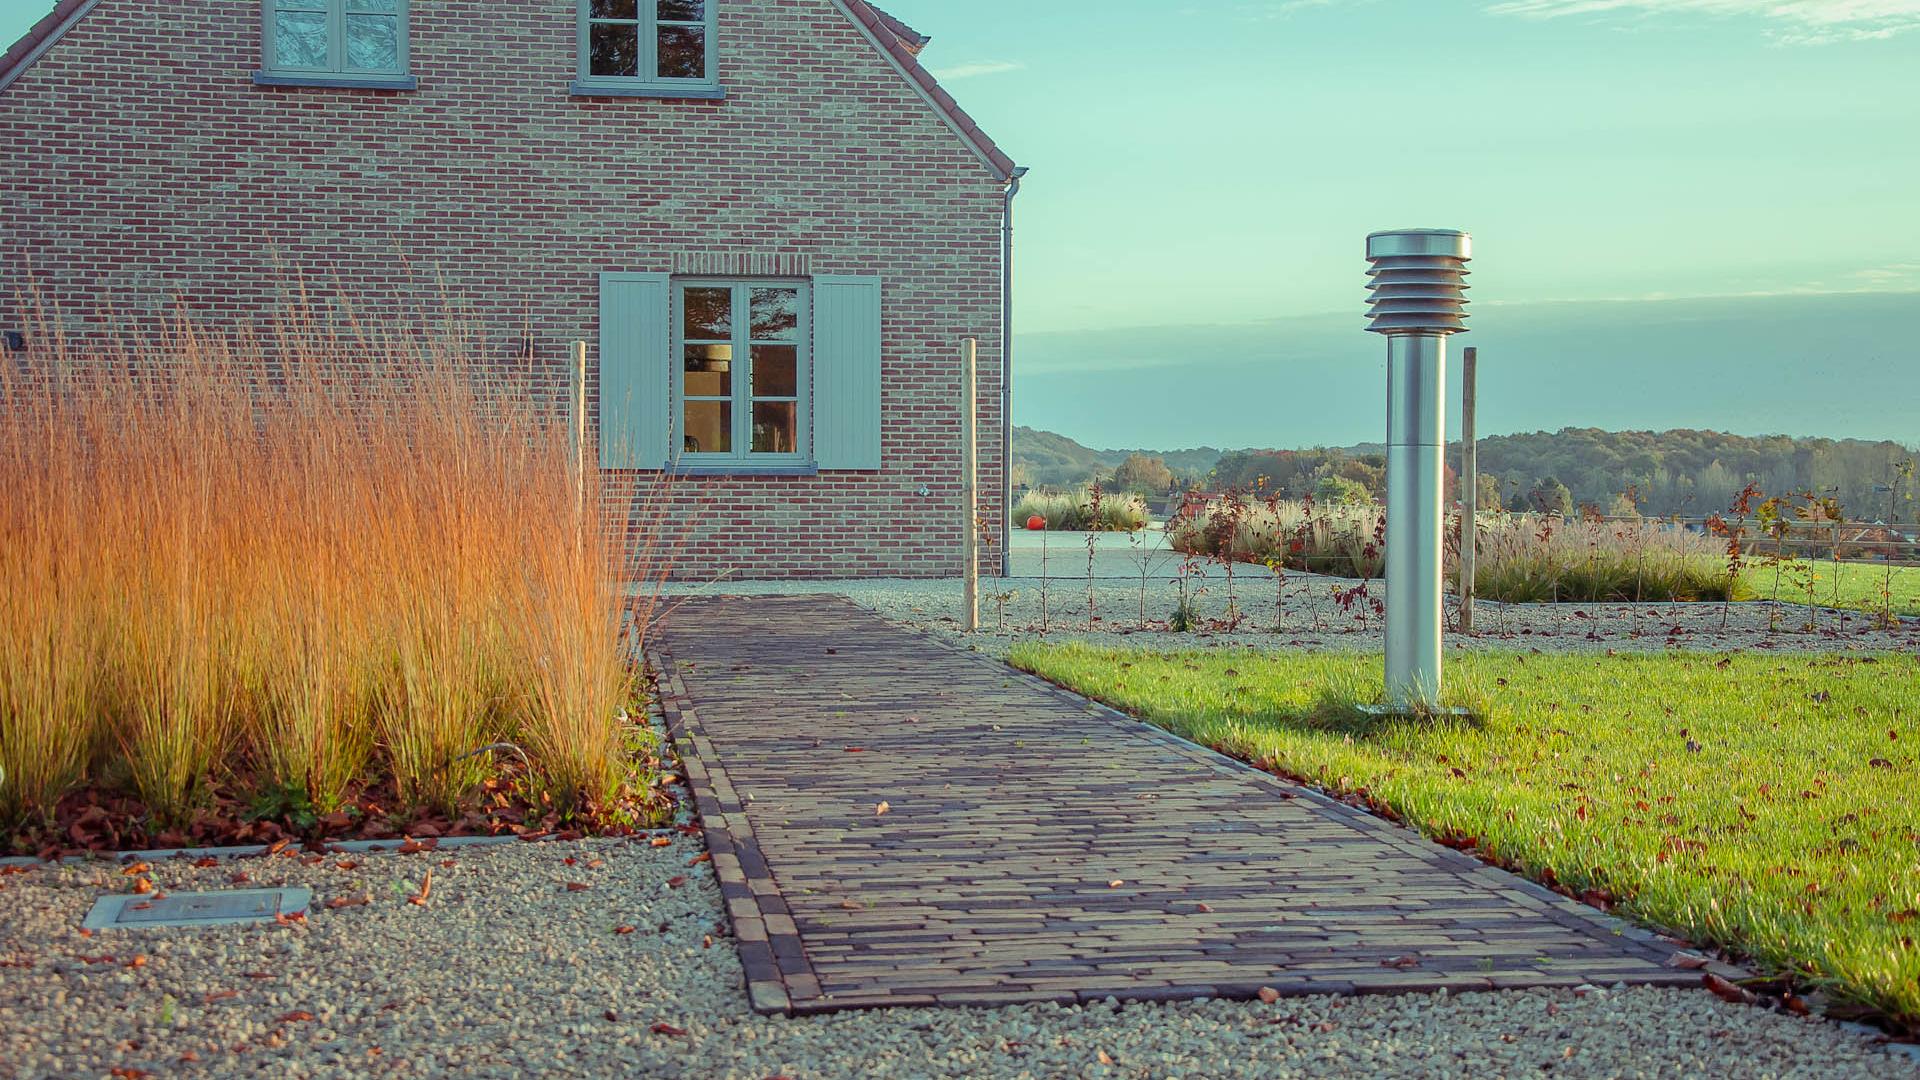 tuinverlichting, tuinpad, graspartij, heuvelwoning